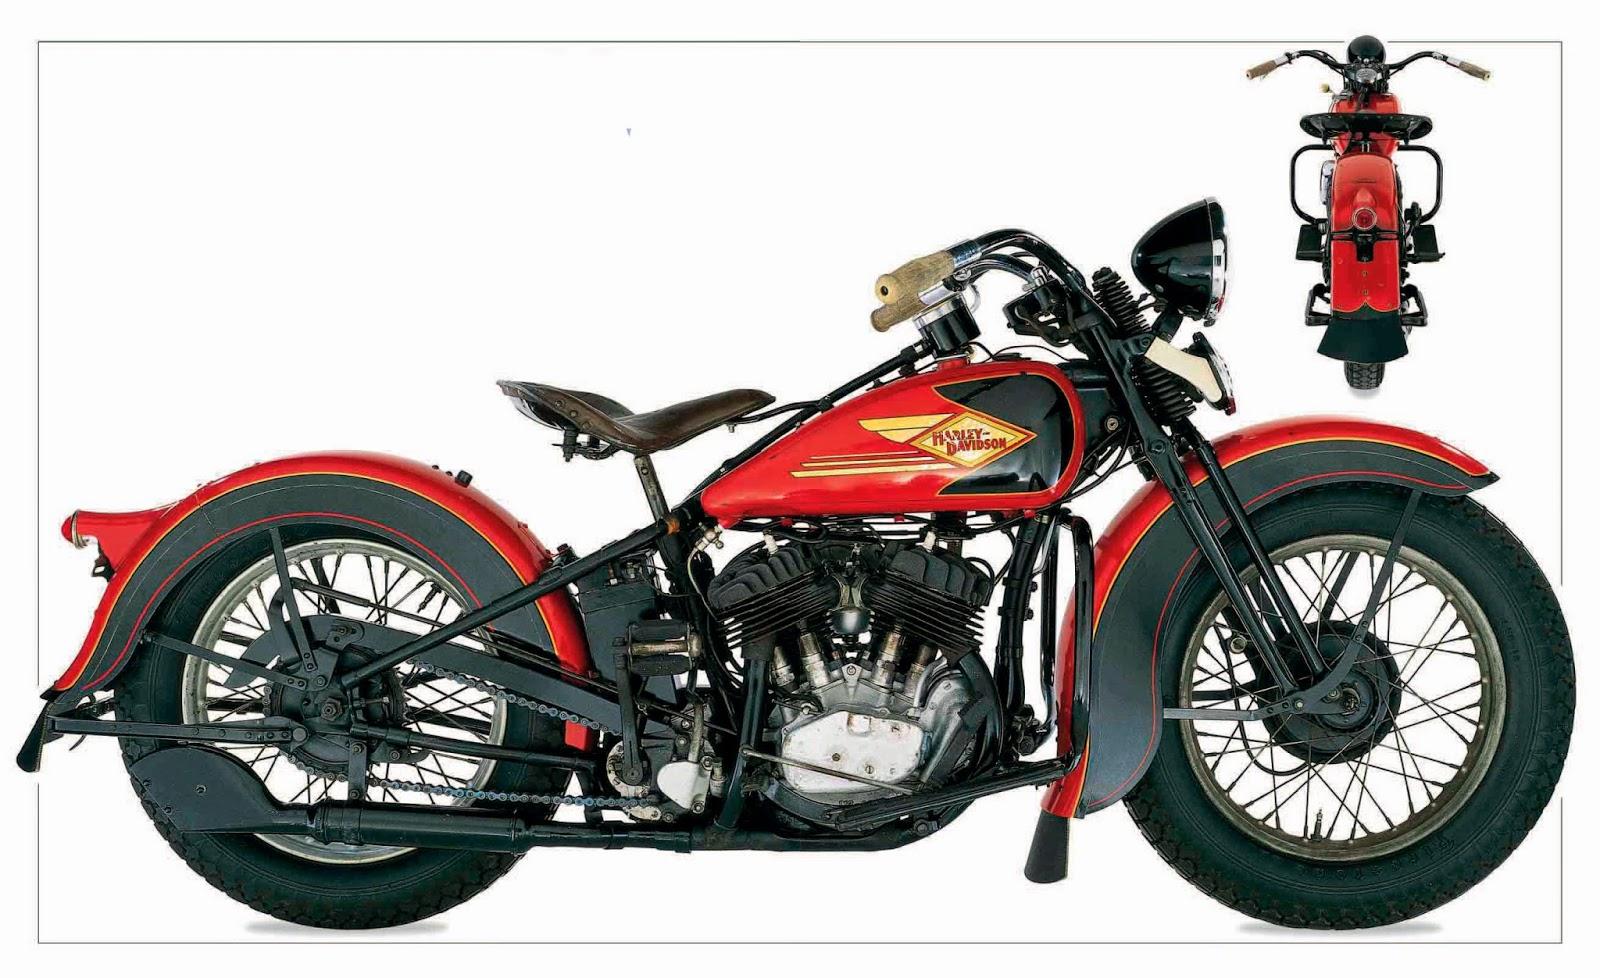 Harley Davidson Motorcycle Parts Diagram Schematic Diagrams Road King Exhaust Moreover Engine 1930 Custom Wiring U2022 Cv Carb